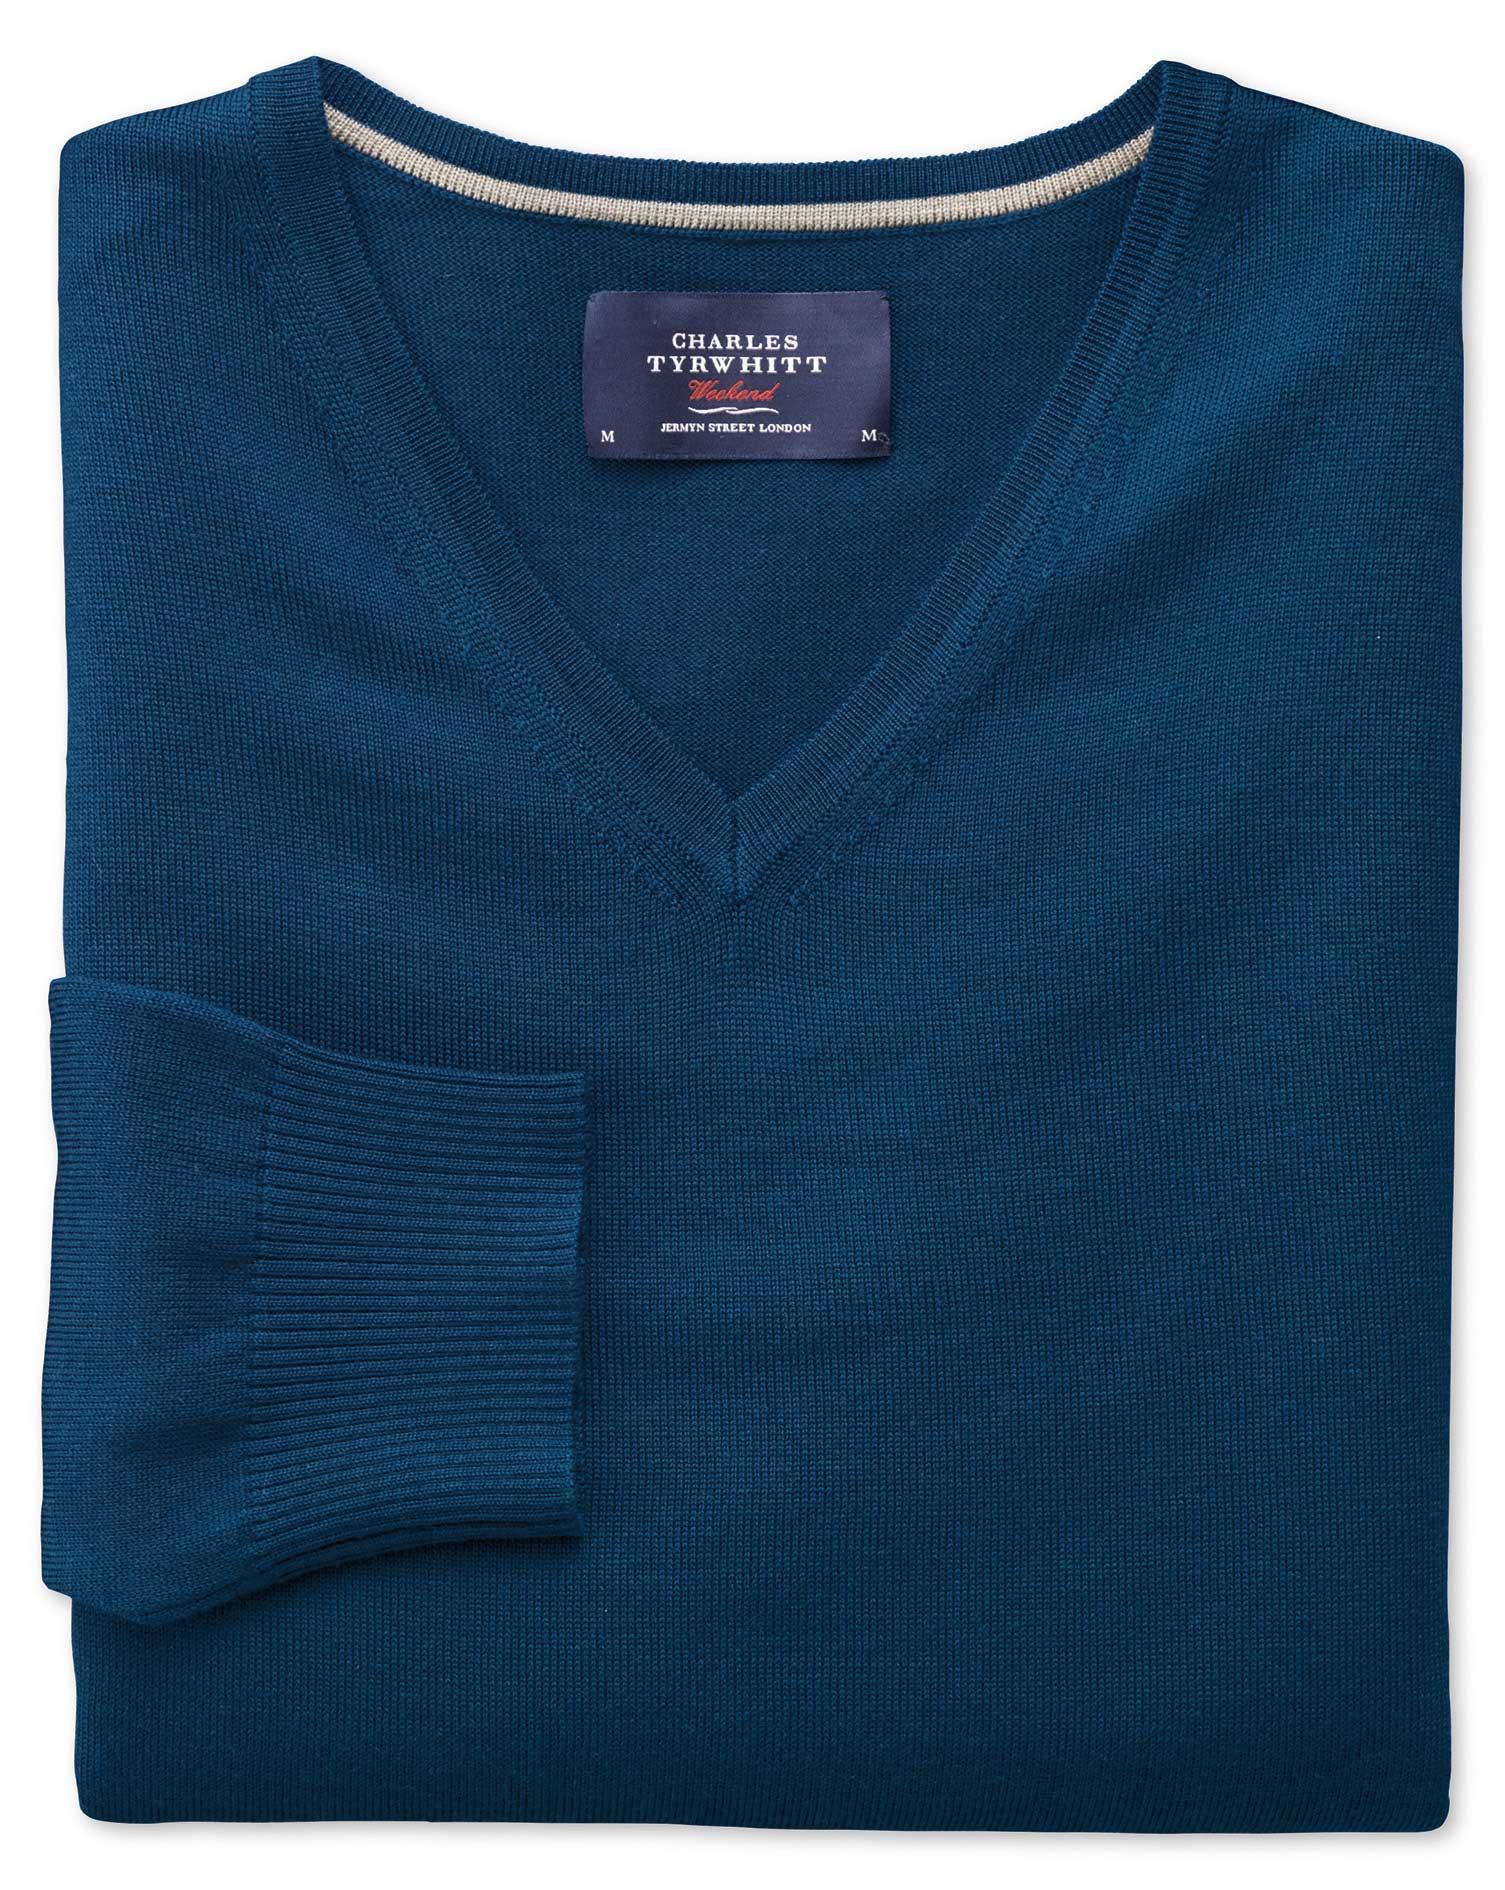 Blue Merino Wool V-Neck Jumper Size XXL by Charles Tyrwhitt